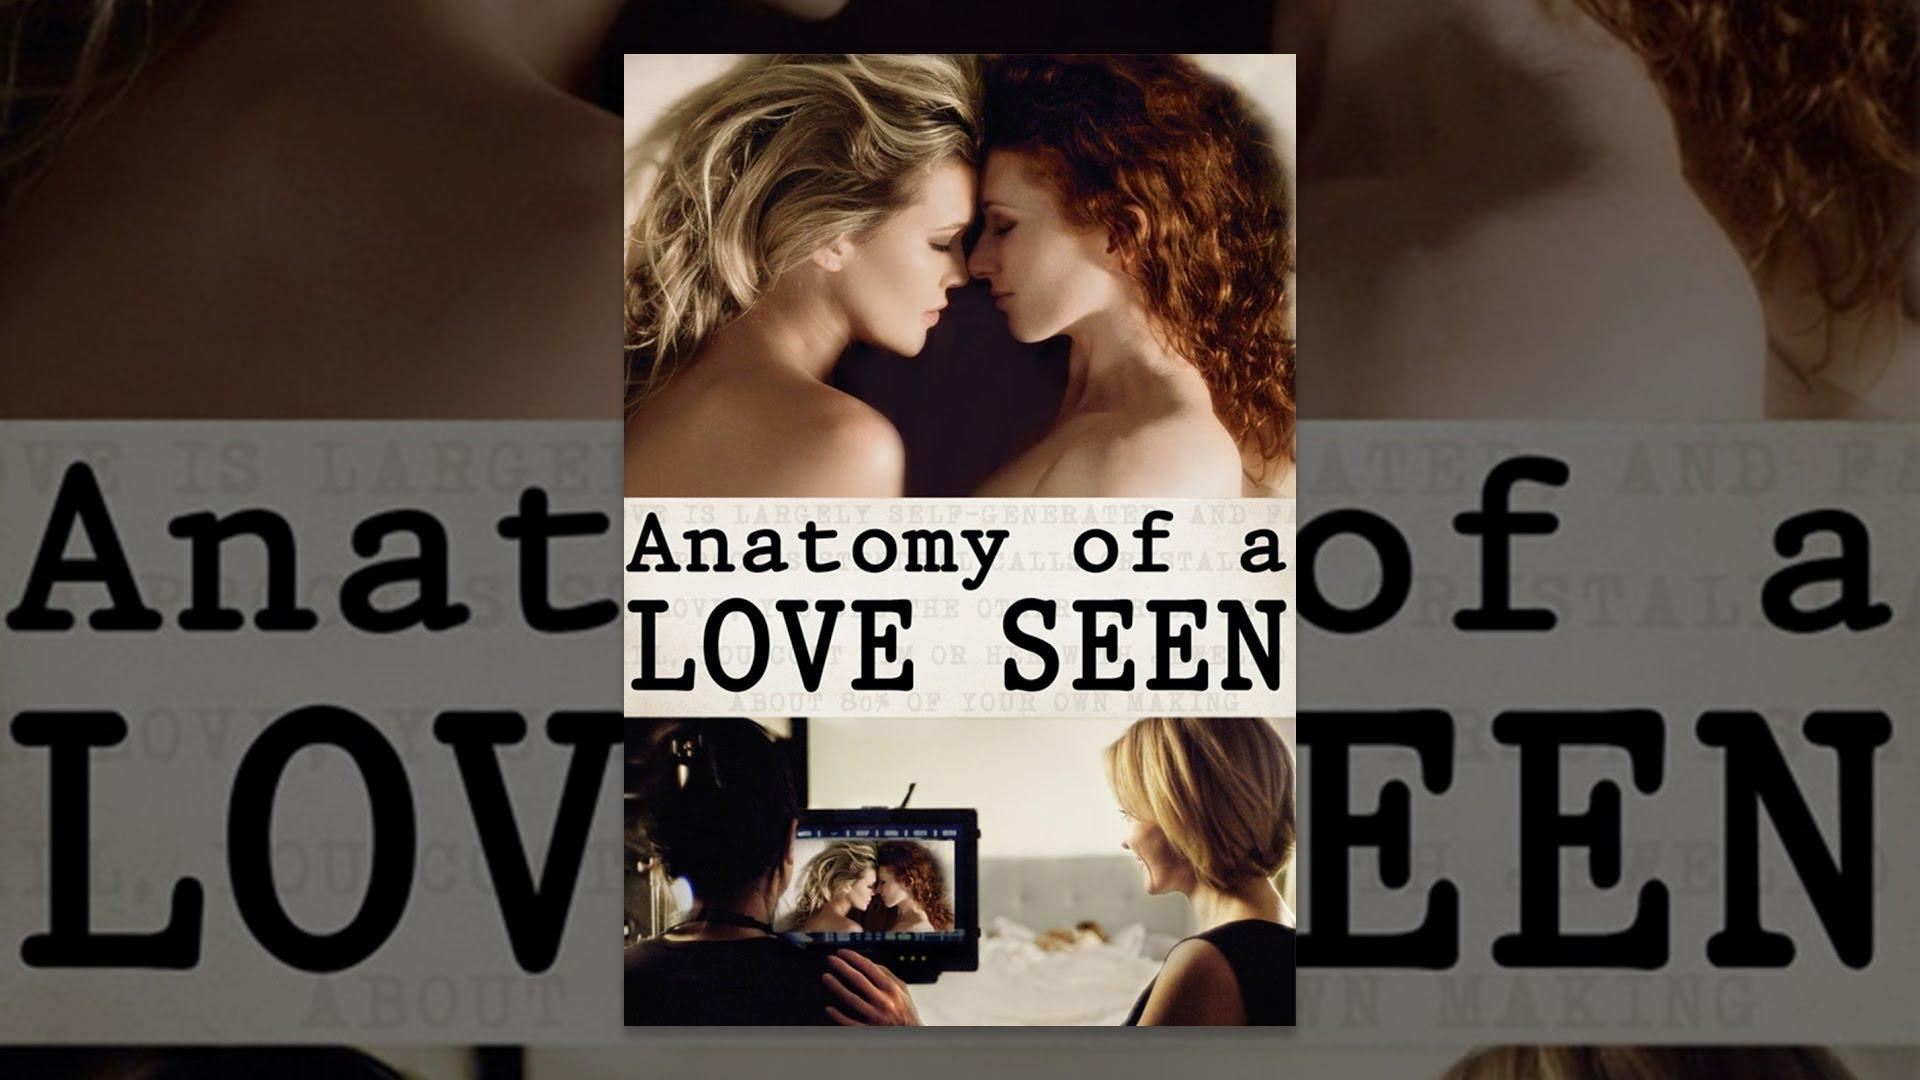 Anatomy Of A Love Seen En Español anatomy of a love seen